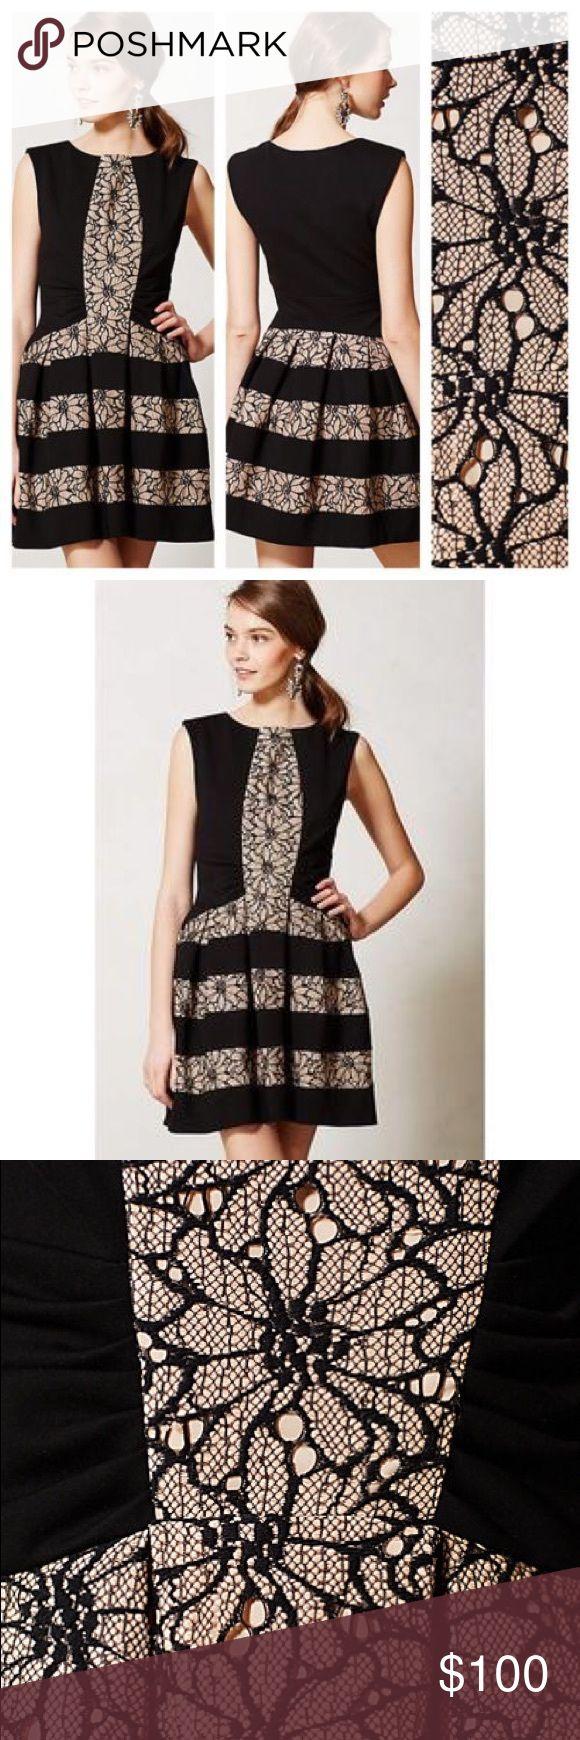 Eva Franco (Anthropologie) Laced Strata Dress Worn once to a wedding Eva Franco Dresses Midi